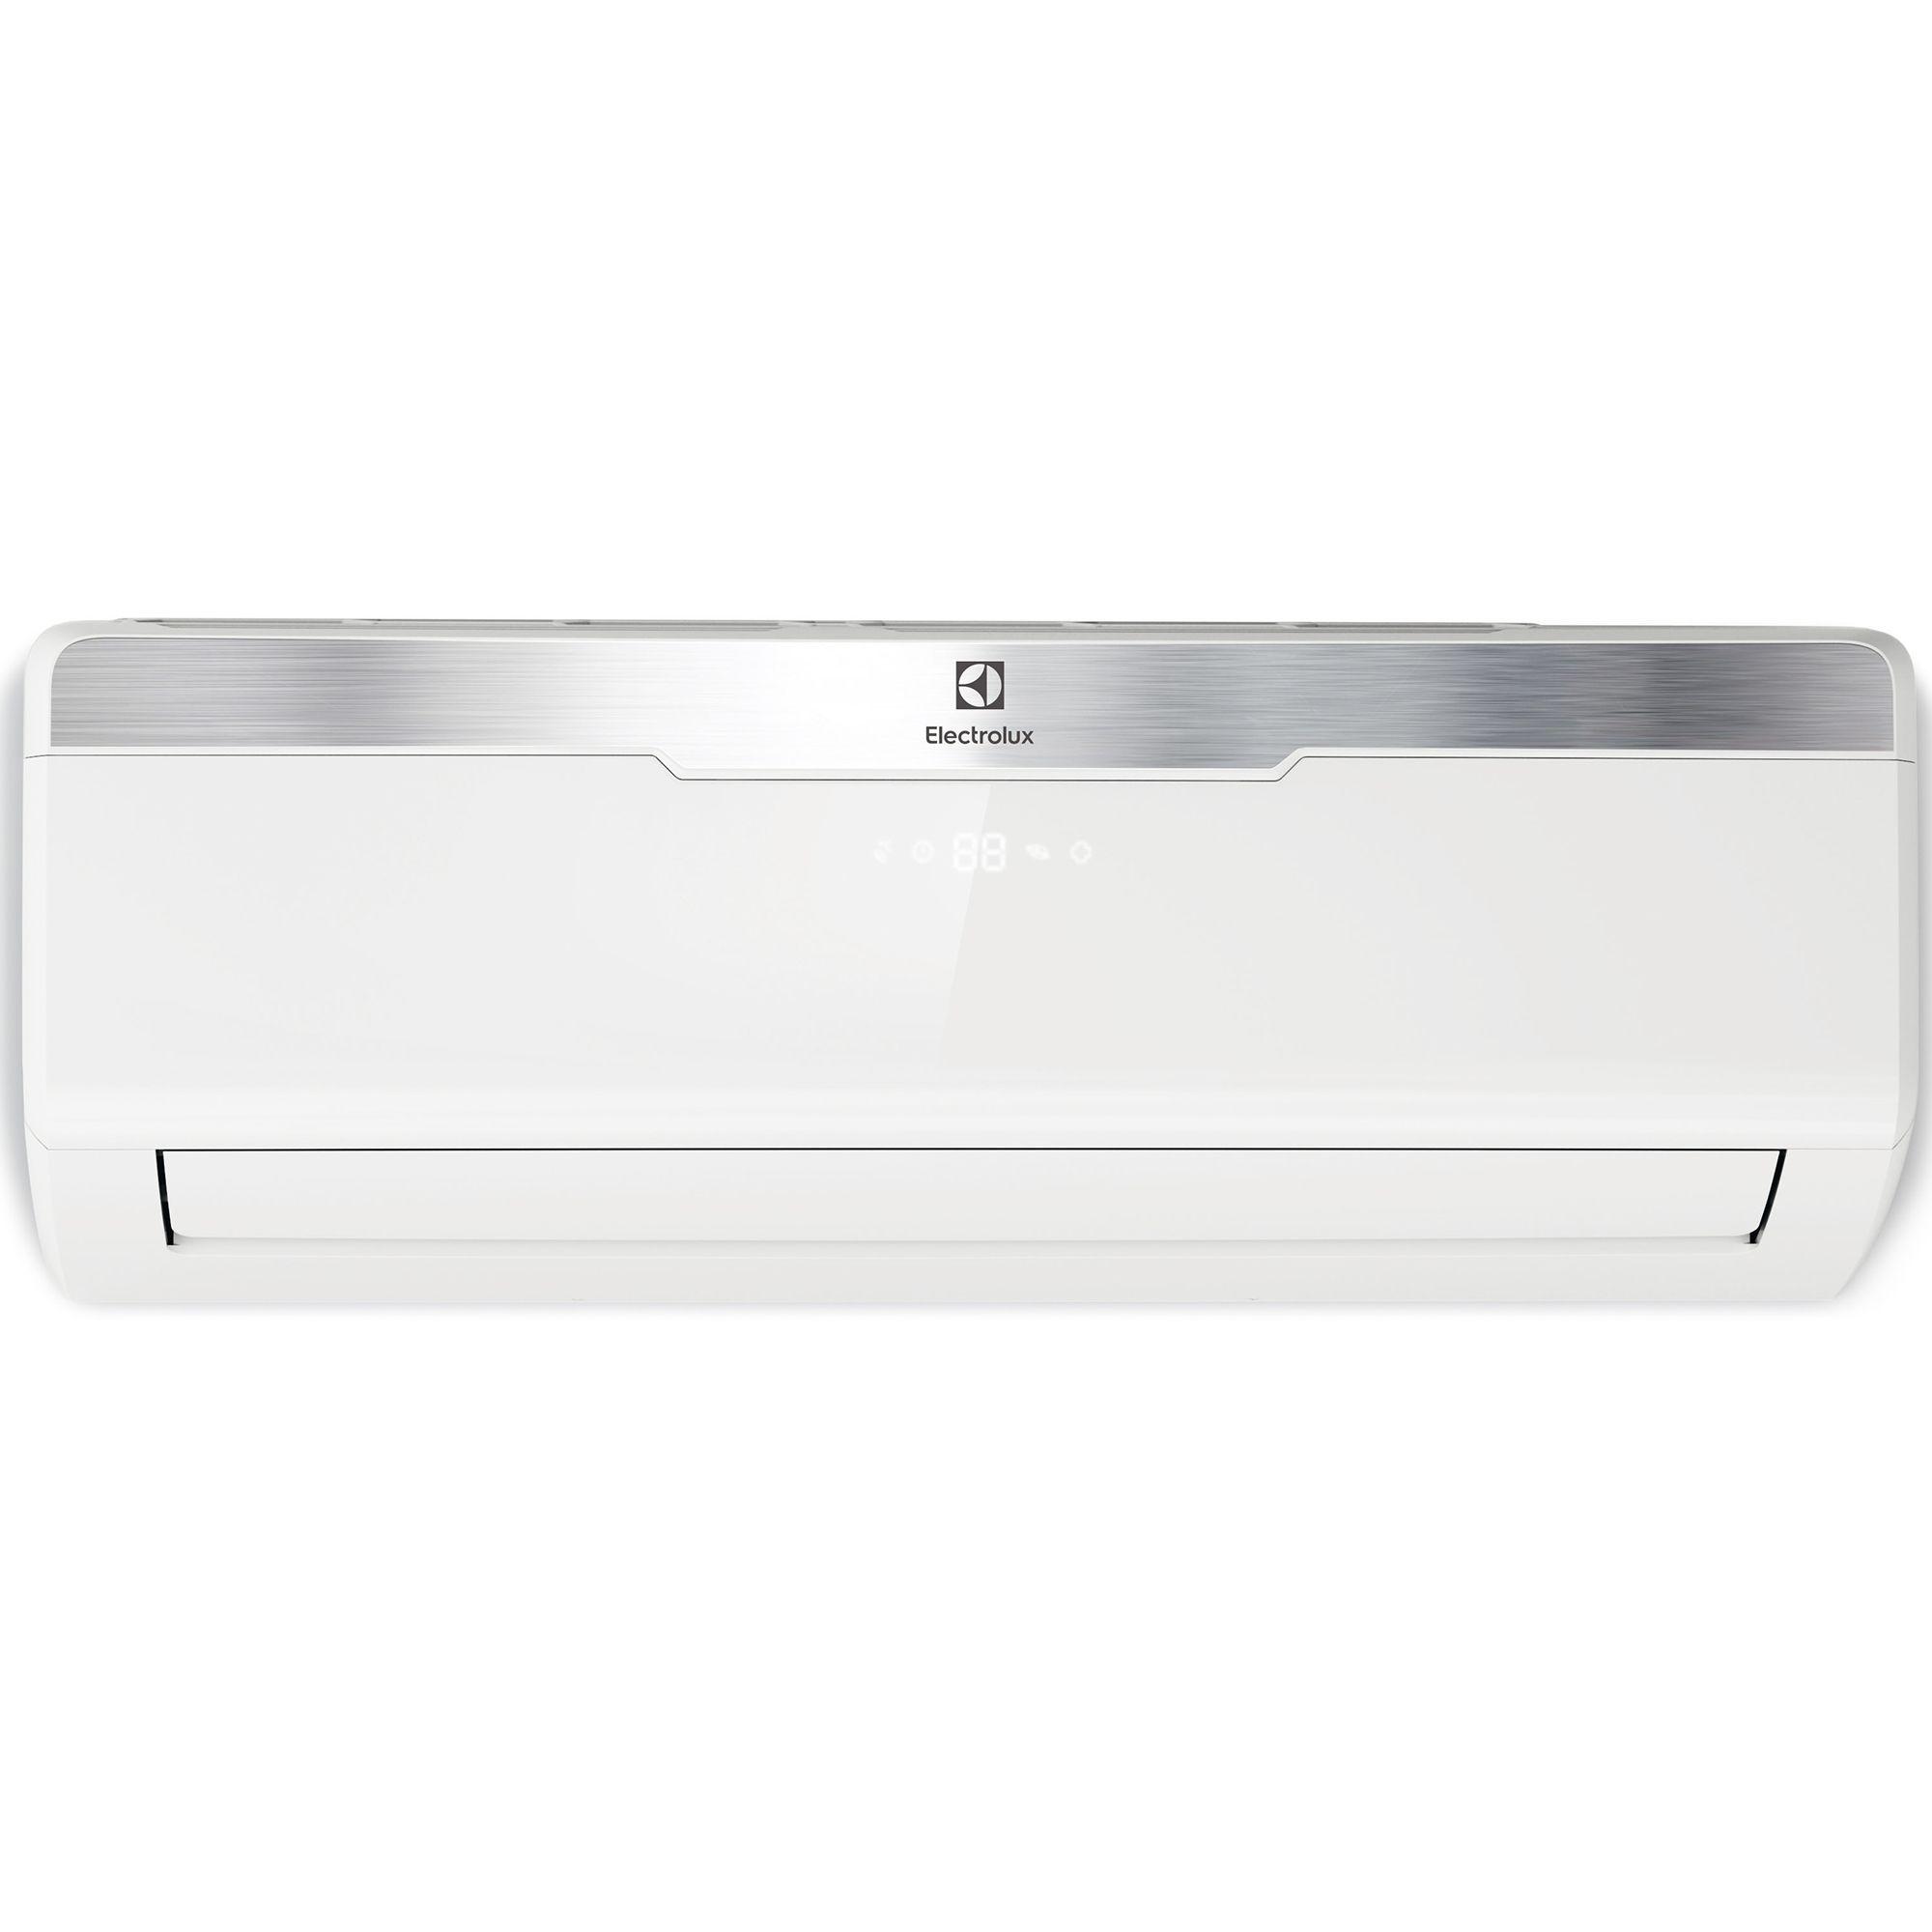 Aparat de aer conditionat Electrolux EXI12HJIW 9000 BTU Inverter